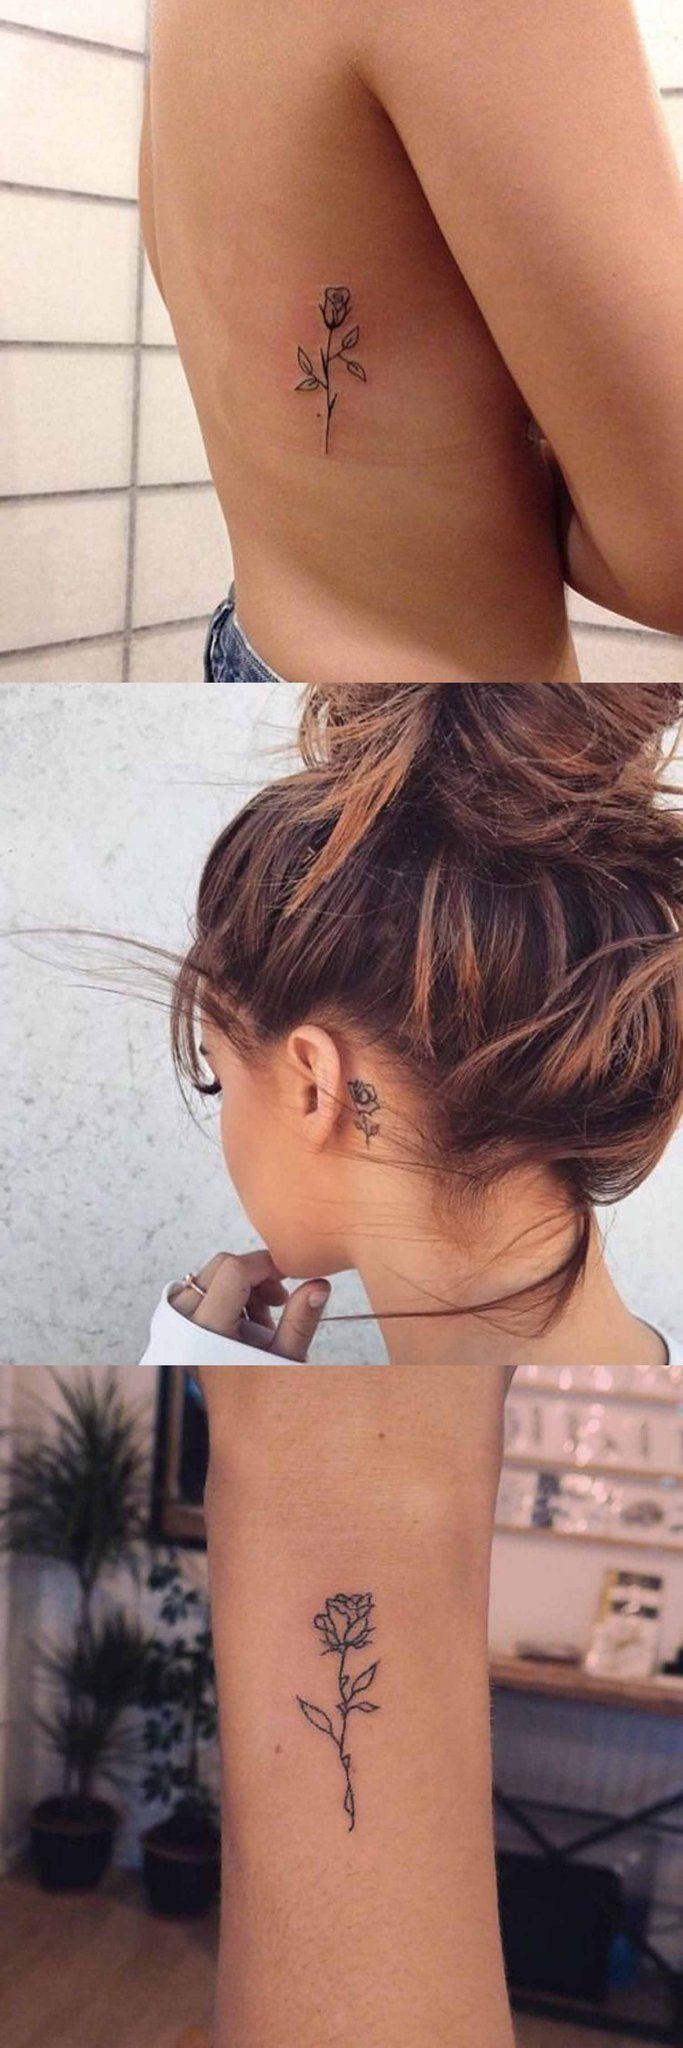 best Tattoo femeninos images on Pinterest